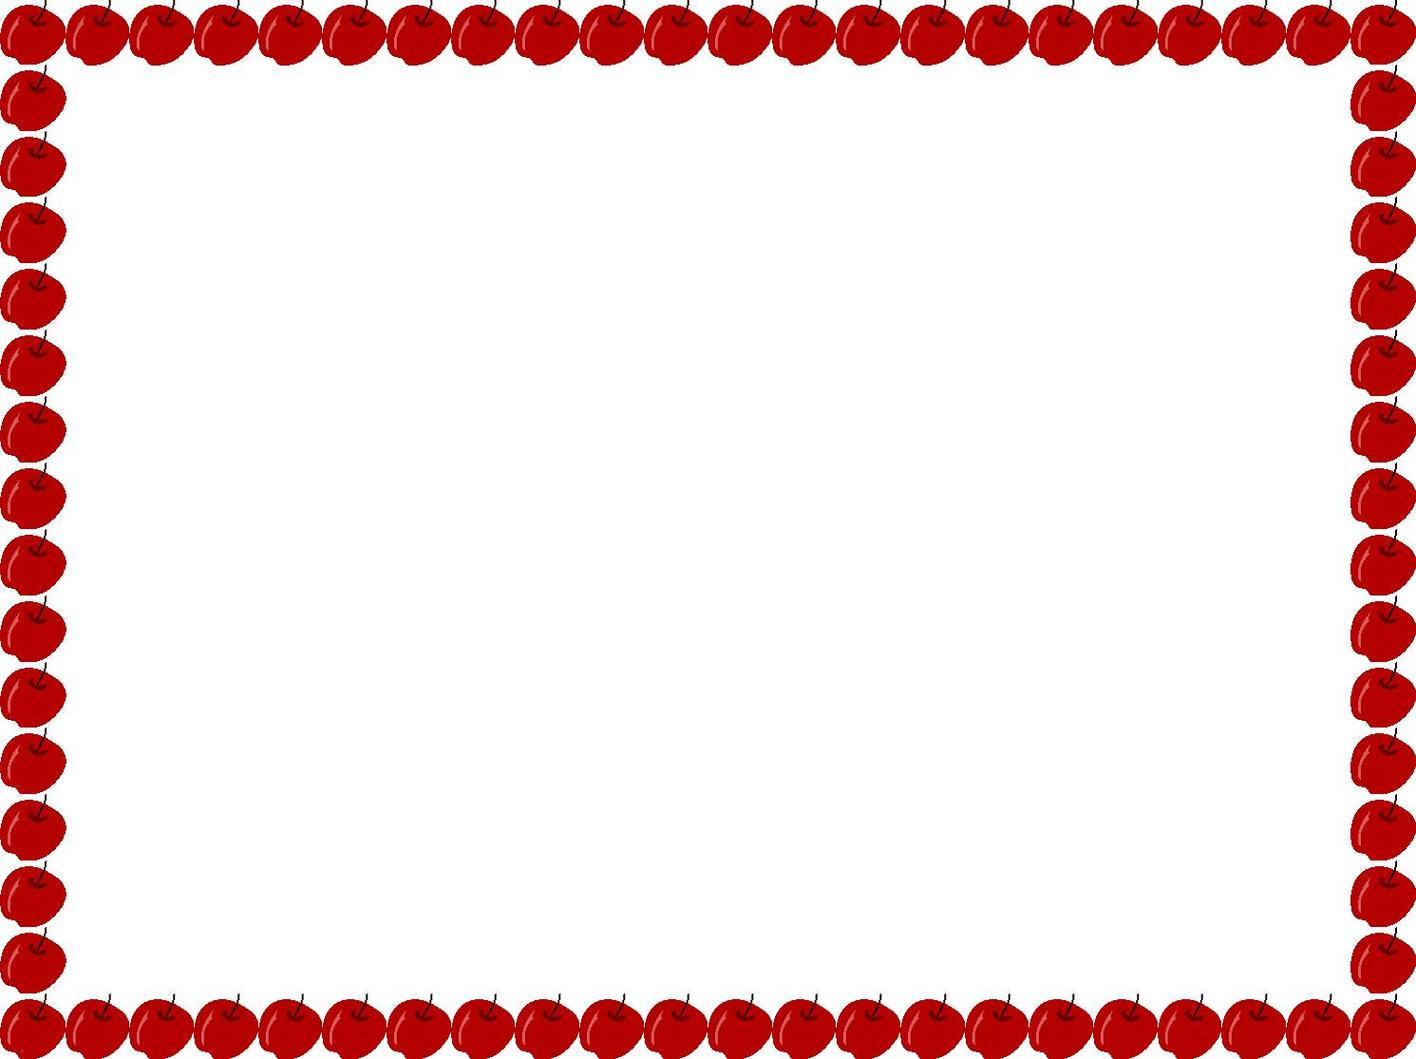 free clip art borders for mac - photo #47